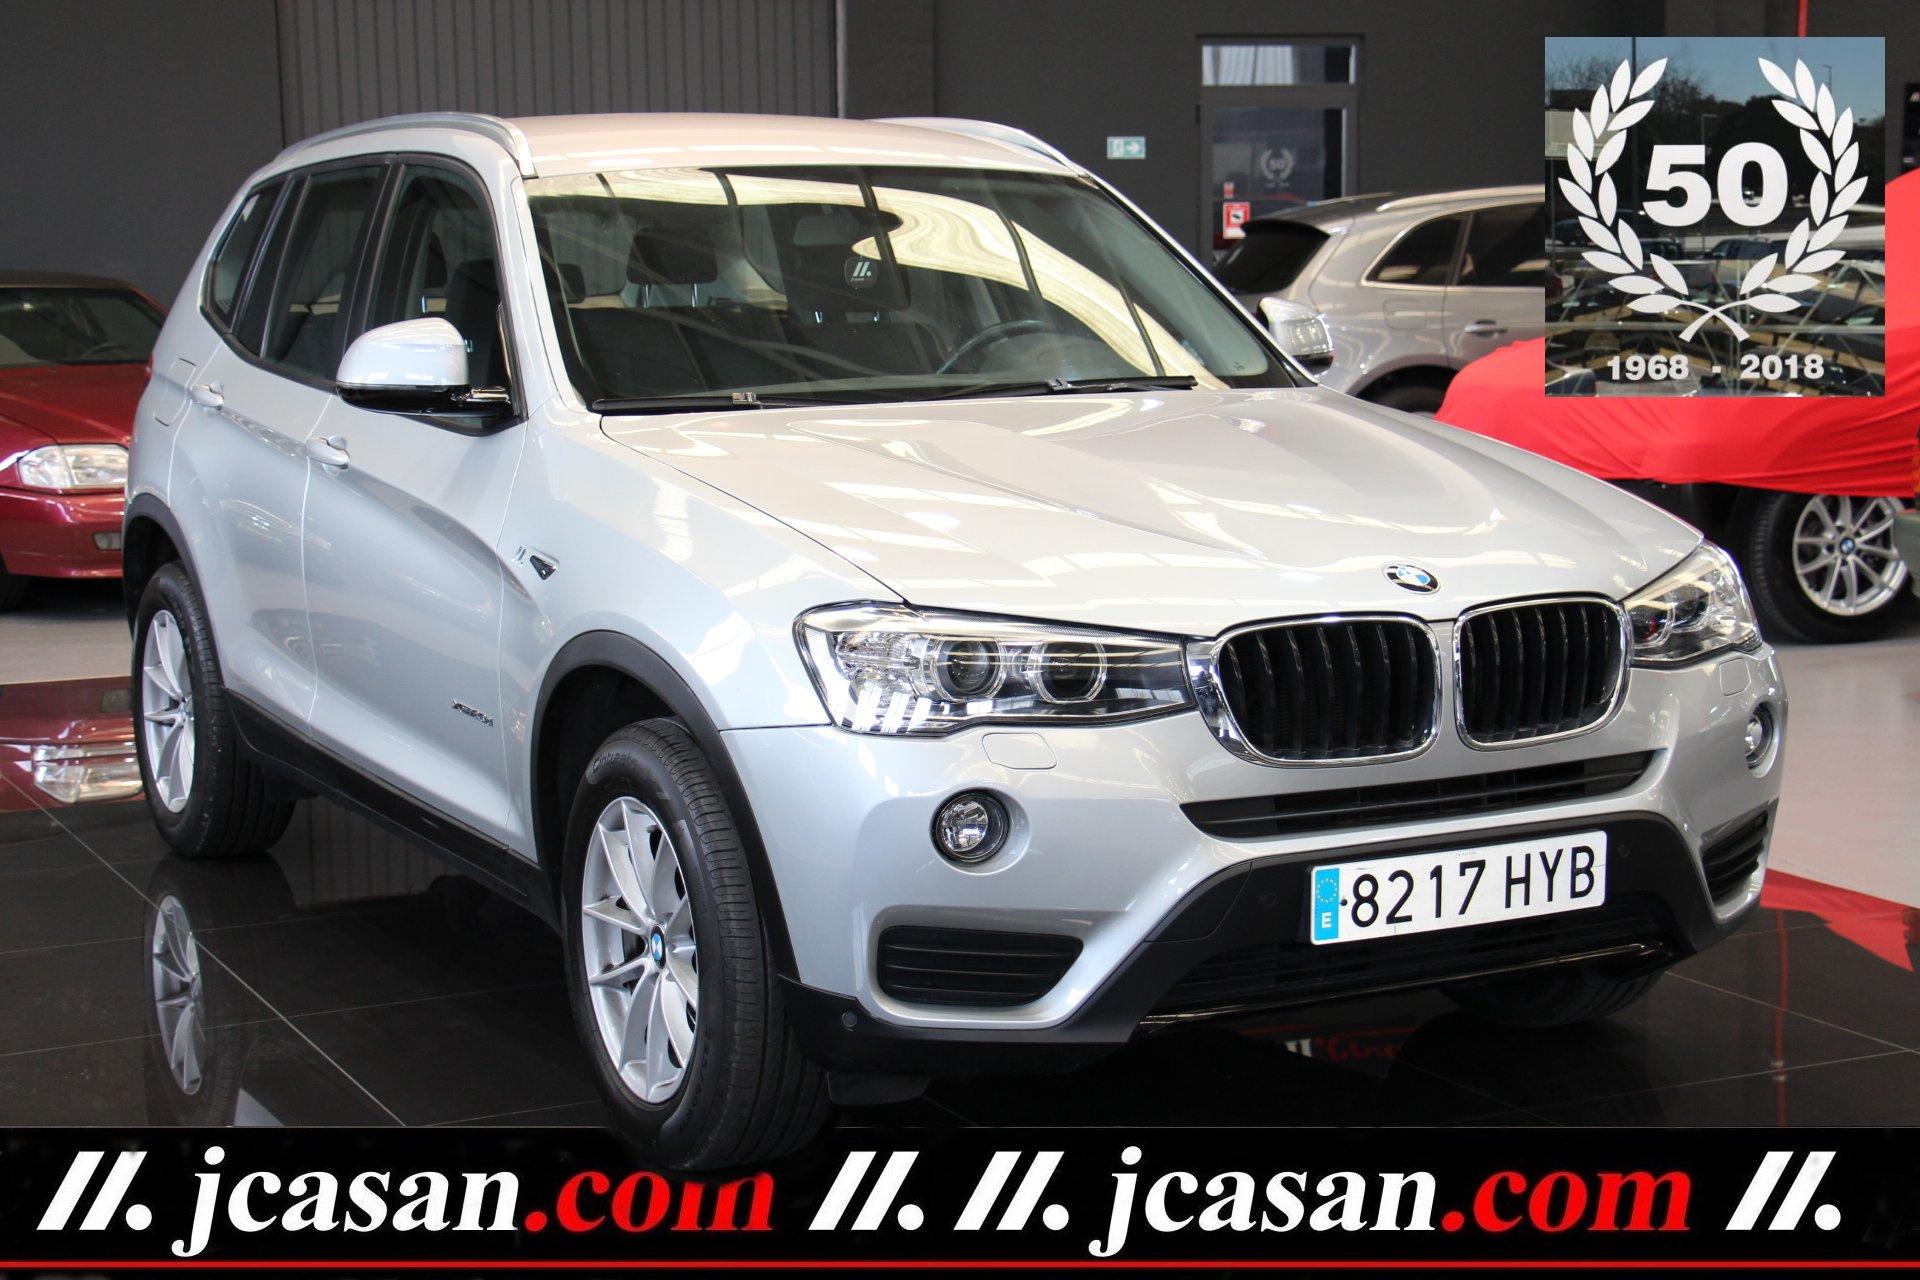 BMW X3 XDRIVE 2.0d 190 CV Euro6 4X4 ref 8217